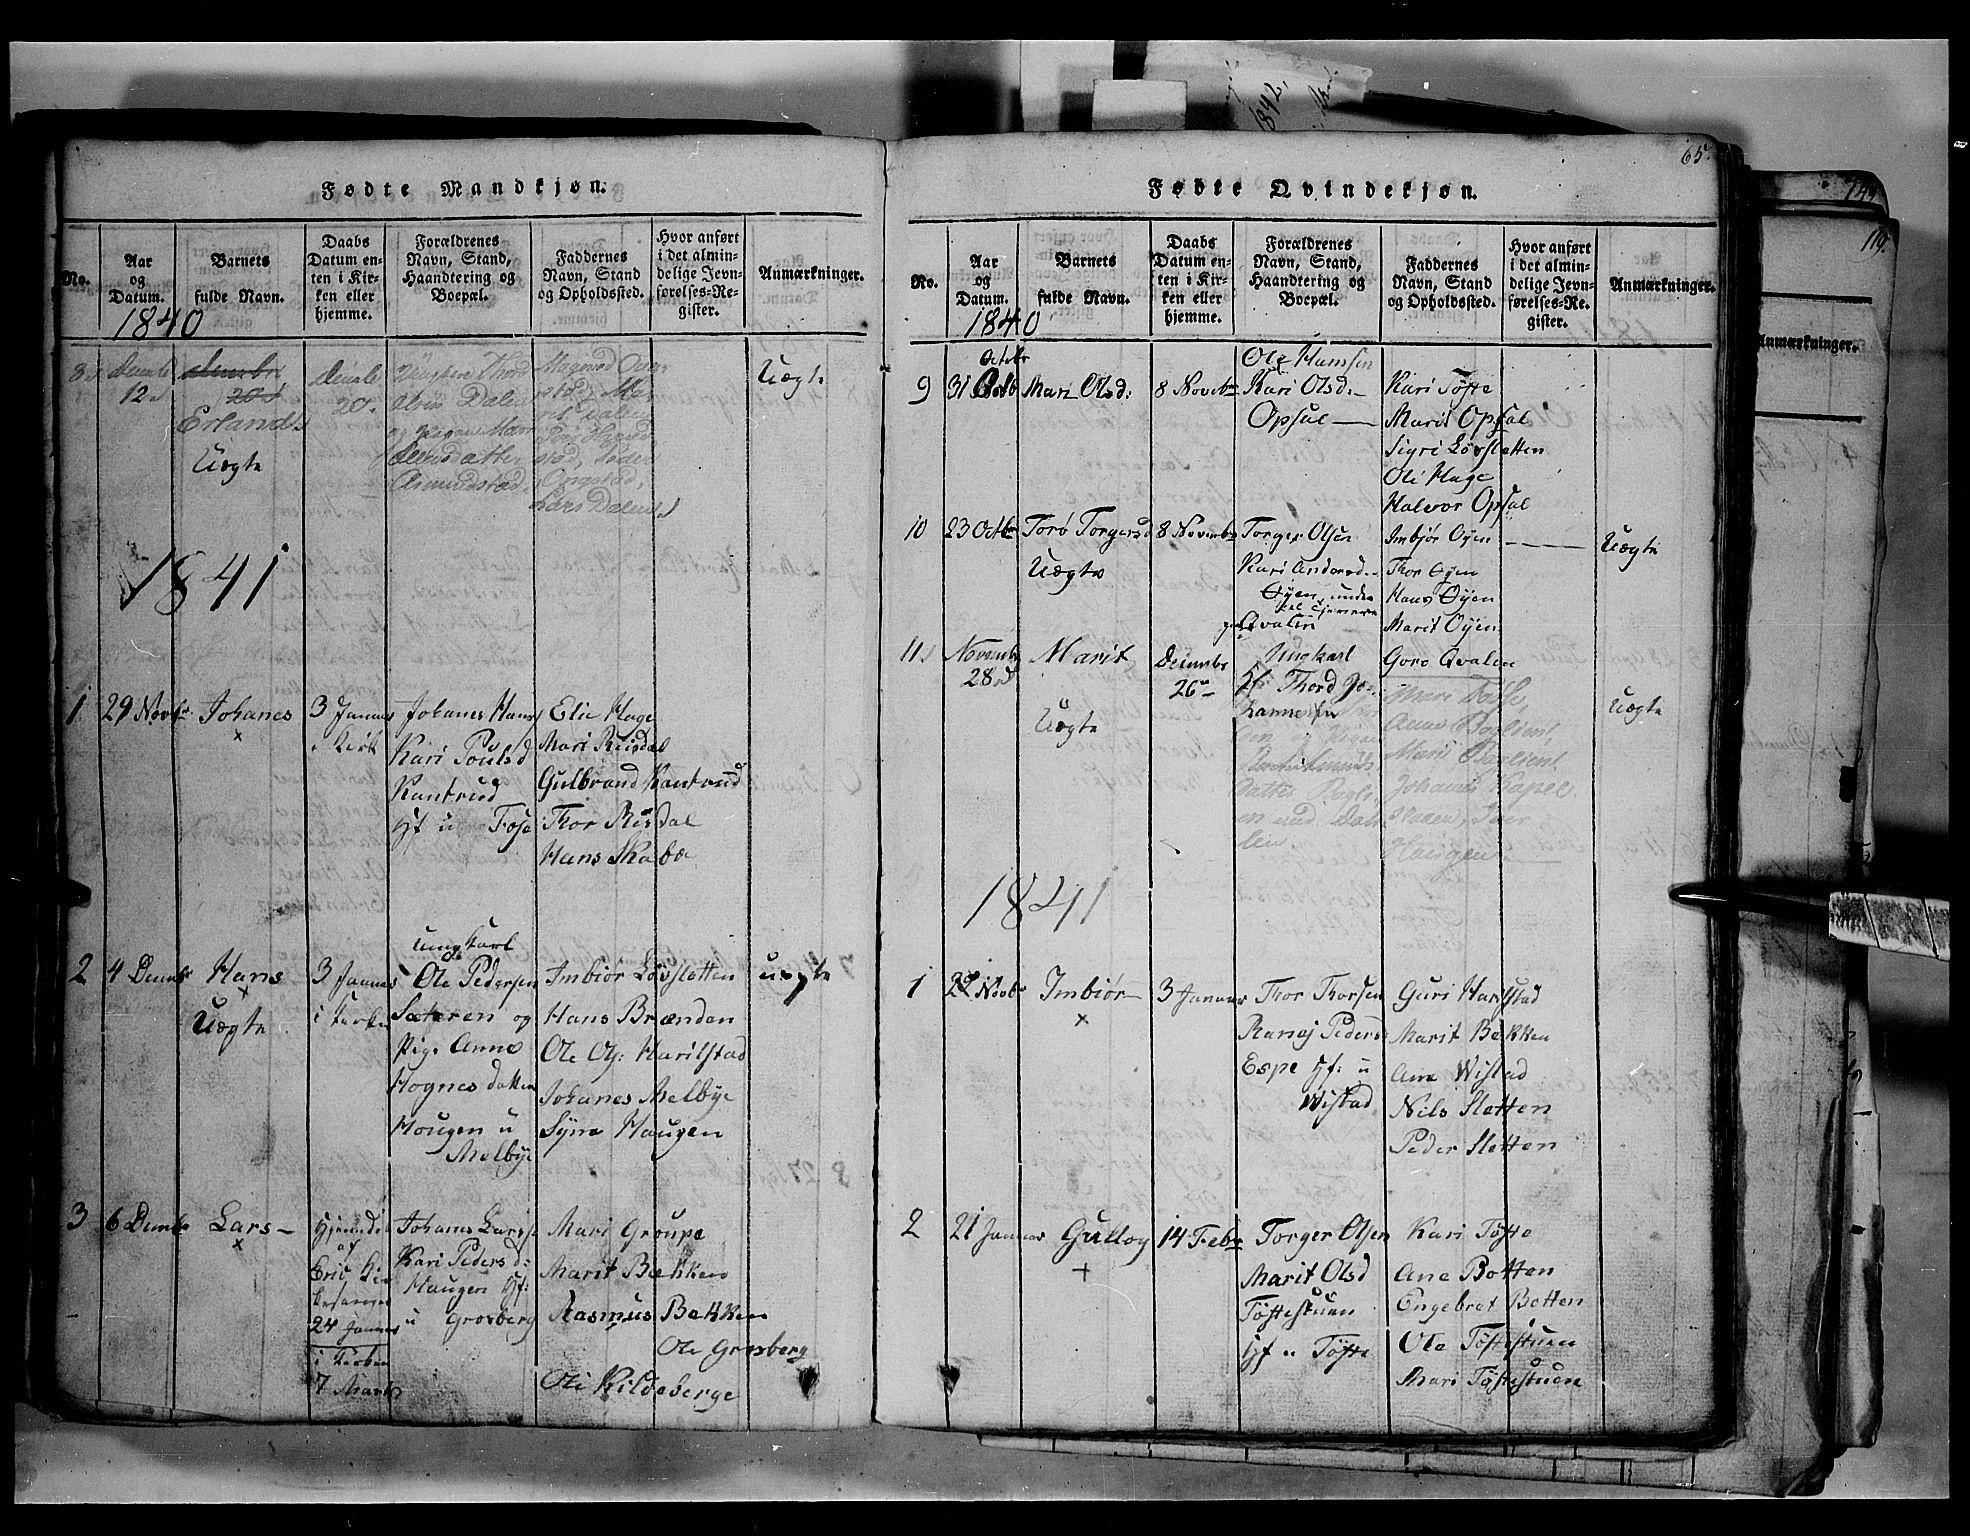 SAH, Fron prestekontor, H/Ha/Hab/L0003: Klokkerbok nr. 3, 1816-1850, s. 65